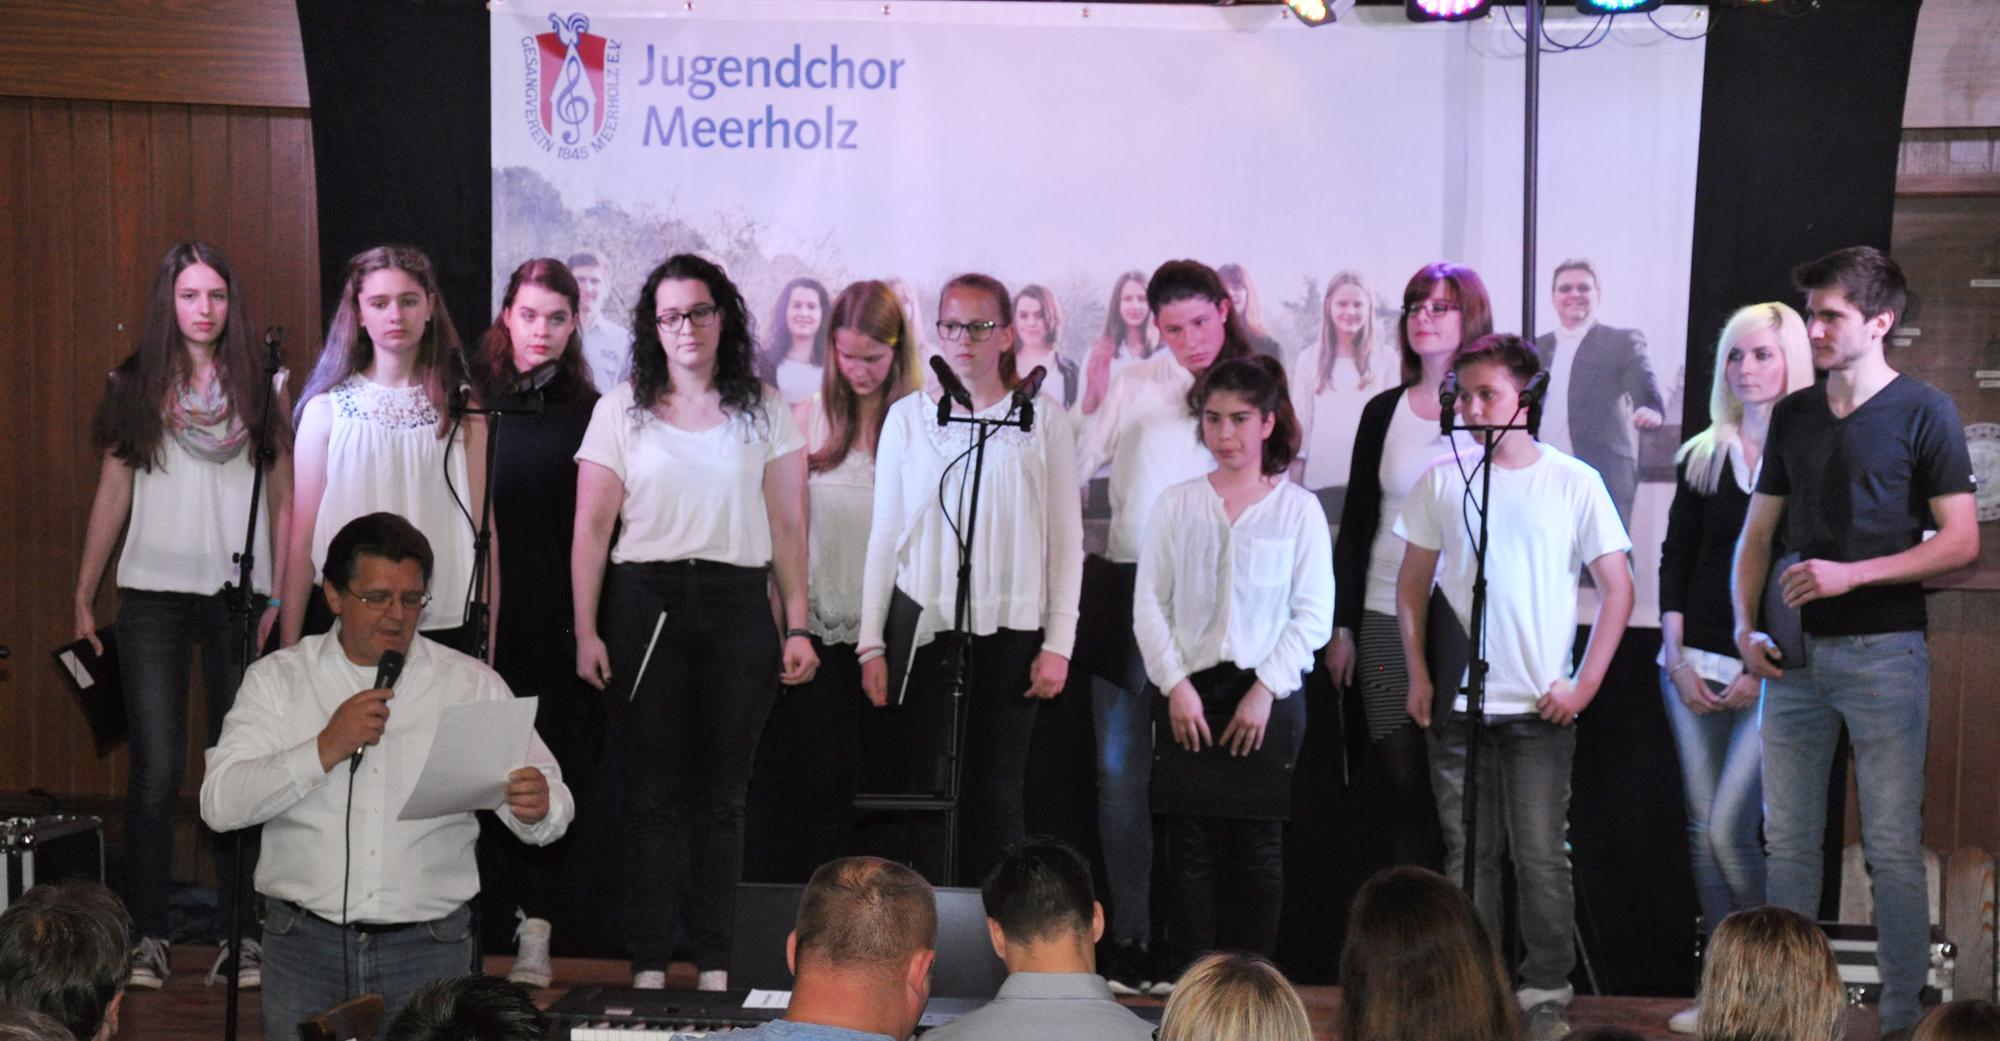 Sängerinnen und Sänger Jugendchor